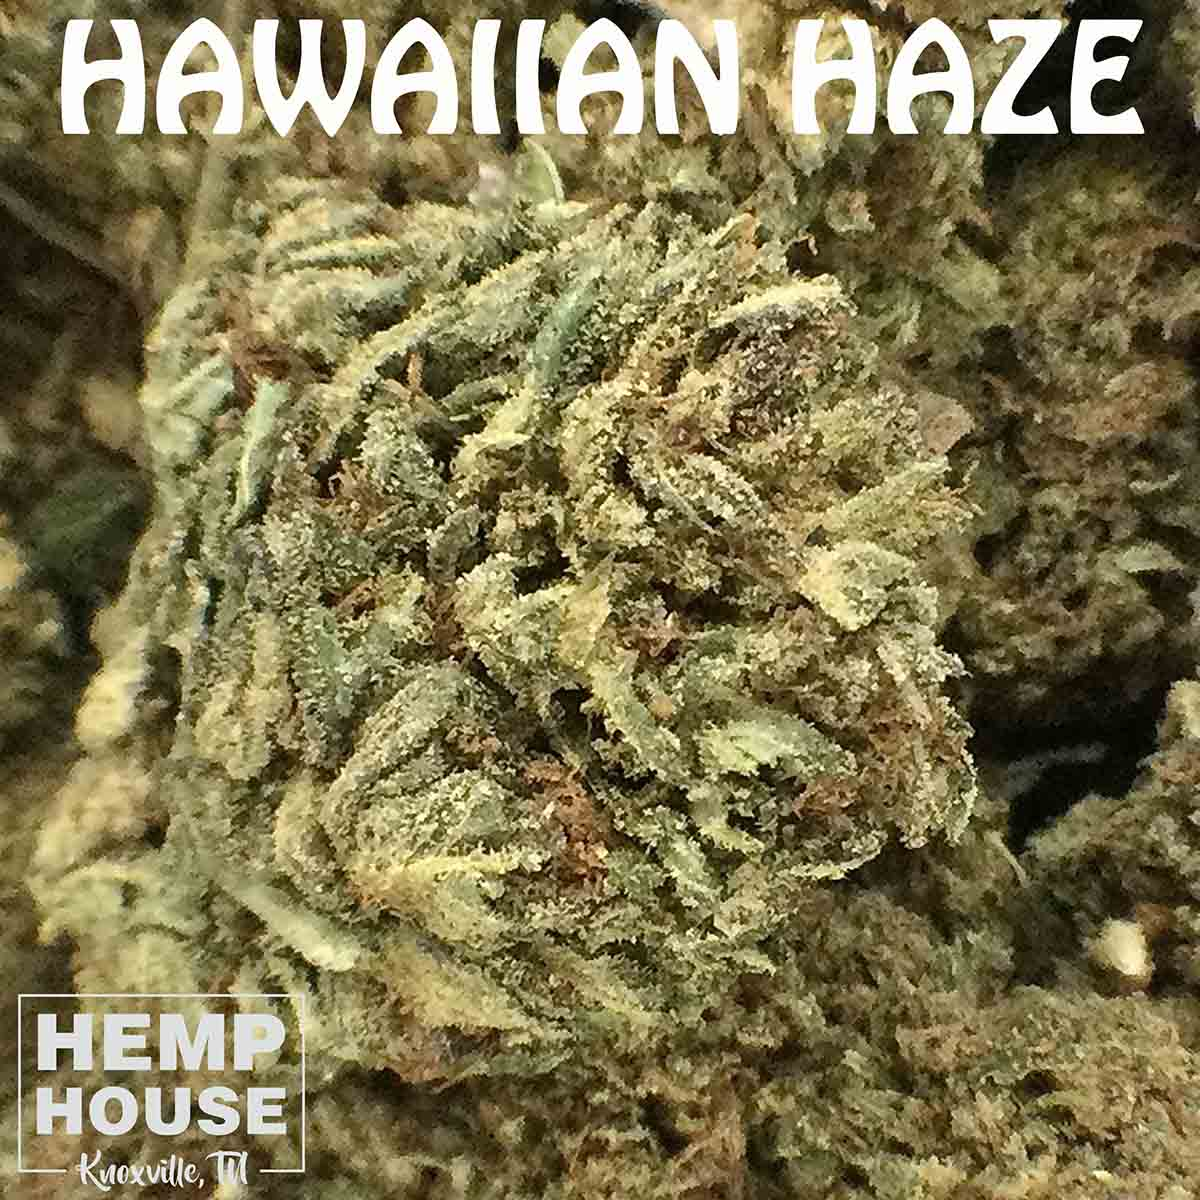 hawaiian haze hemp flower near me knoxville tn hemp house cbd near me